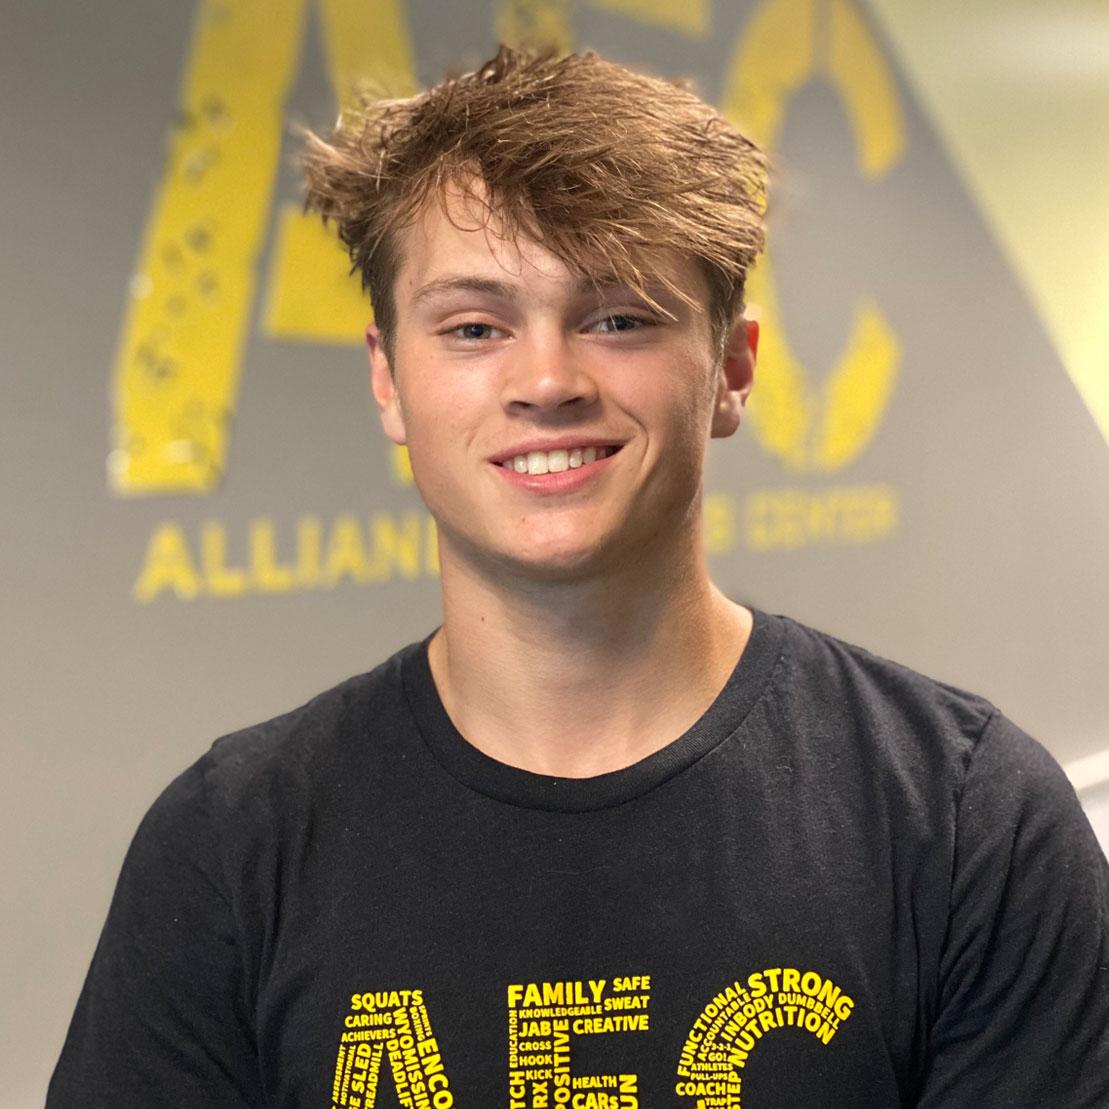 Luke MacDonald Alliance Fitness Center